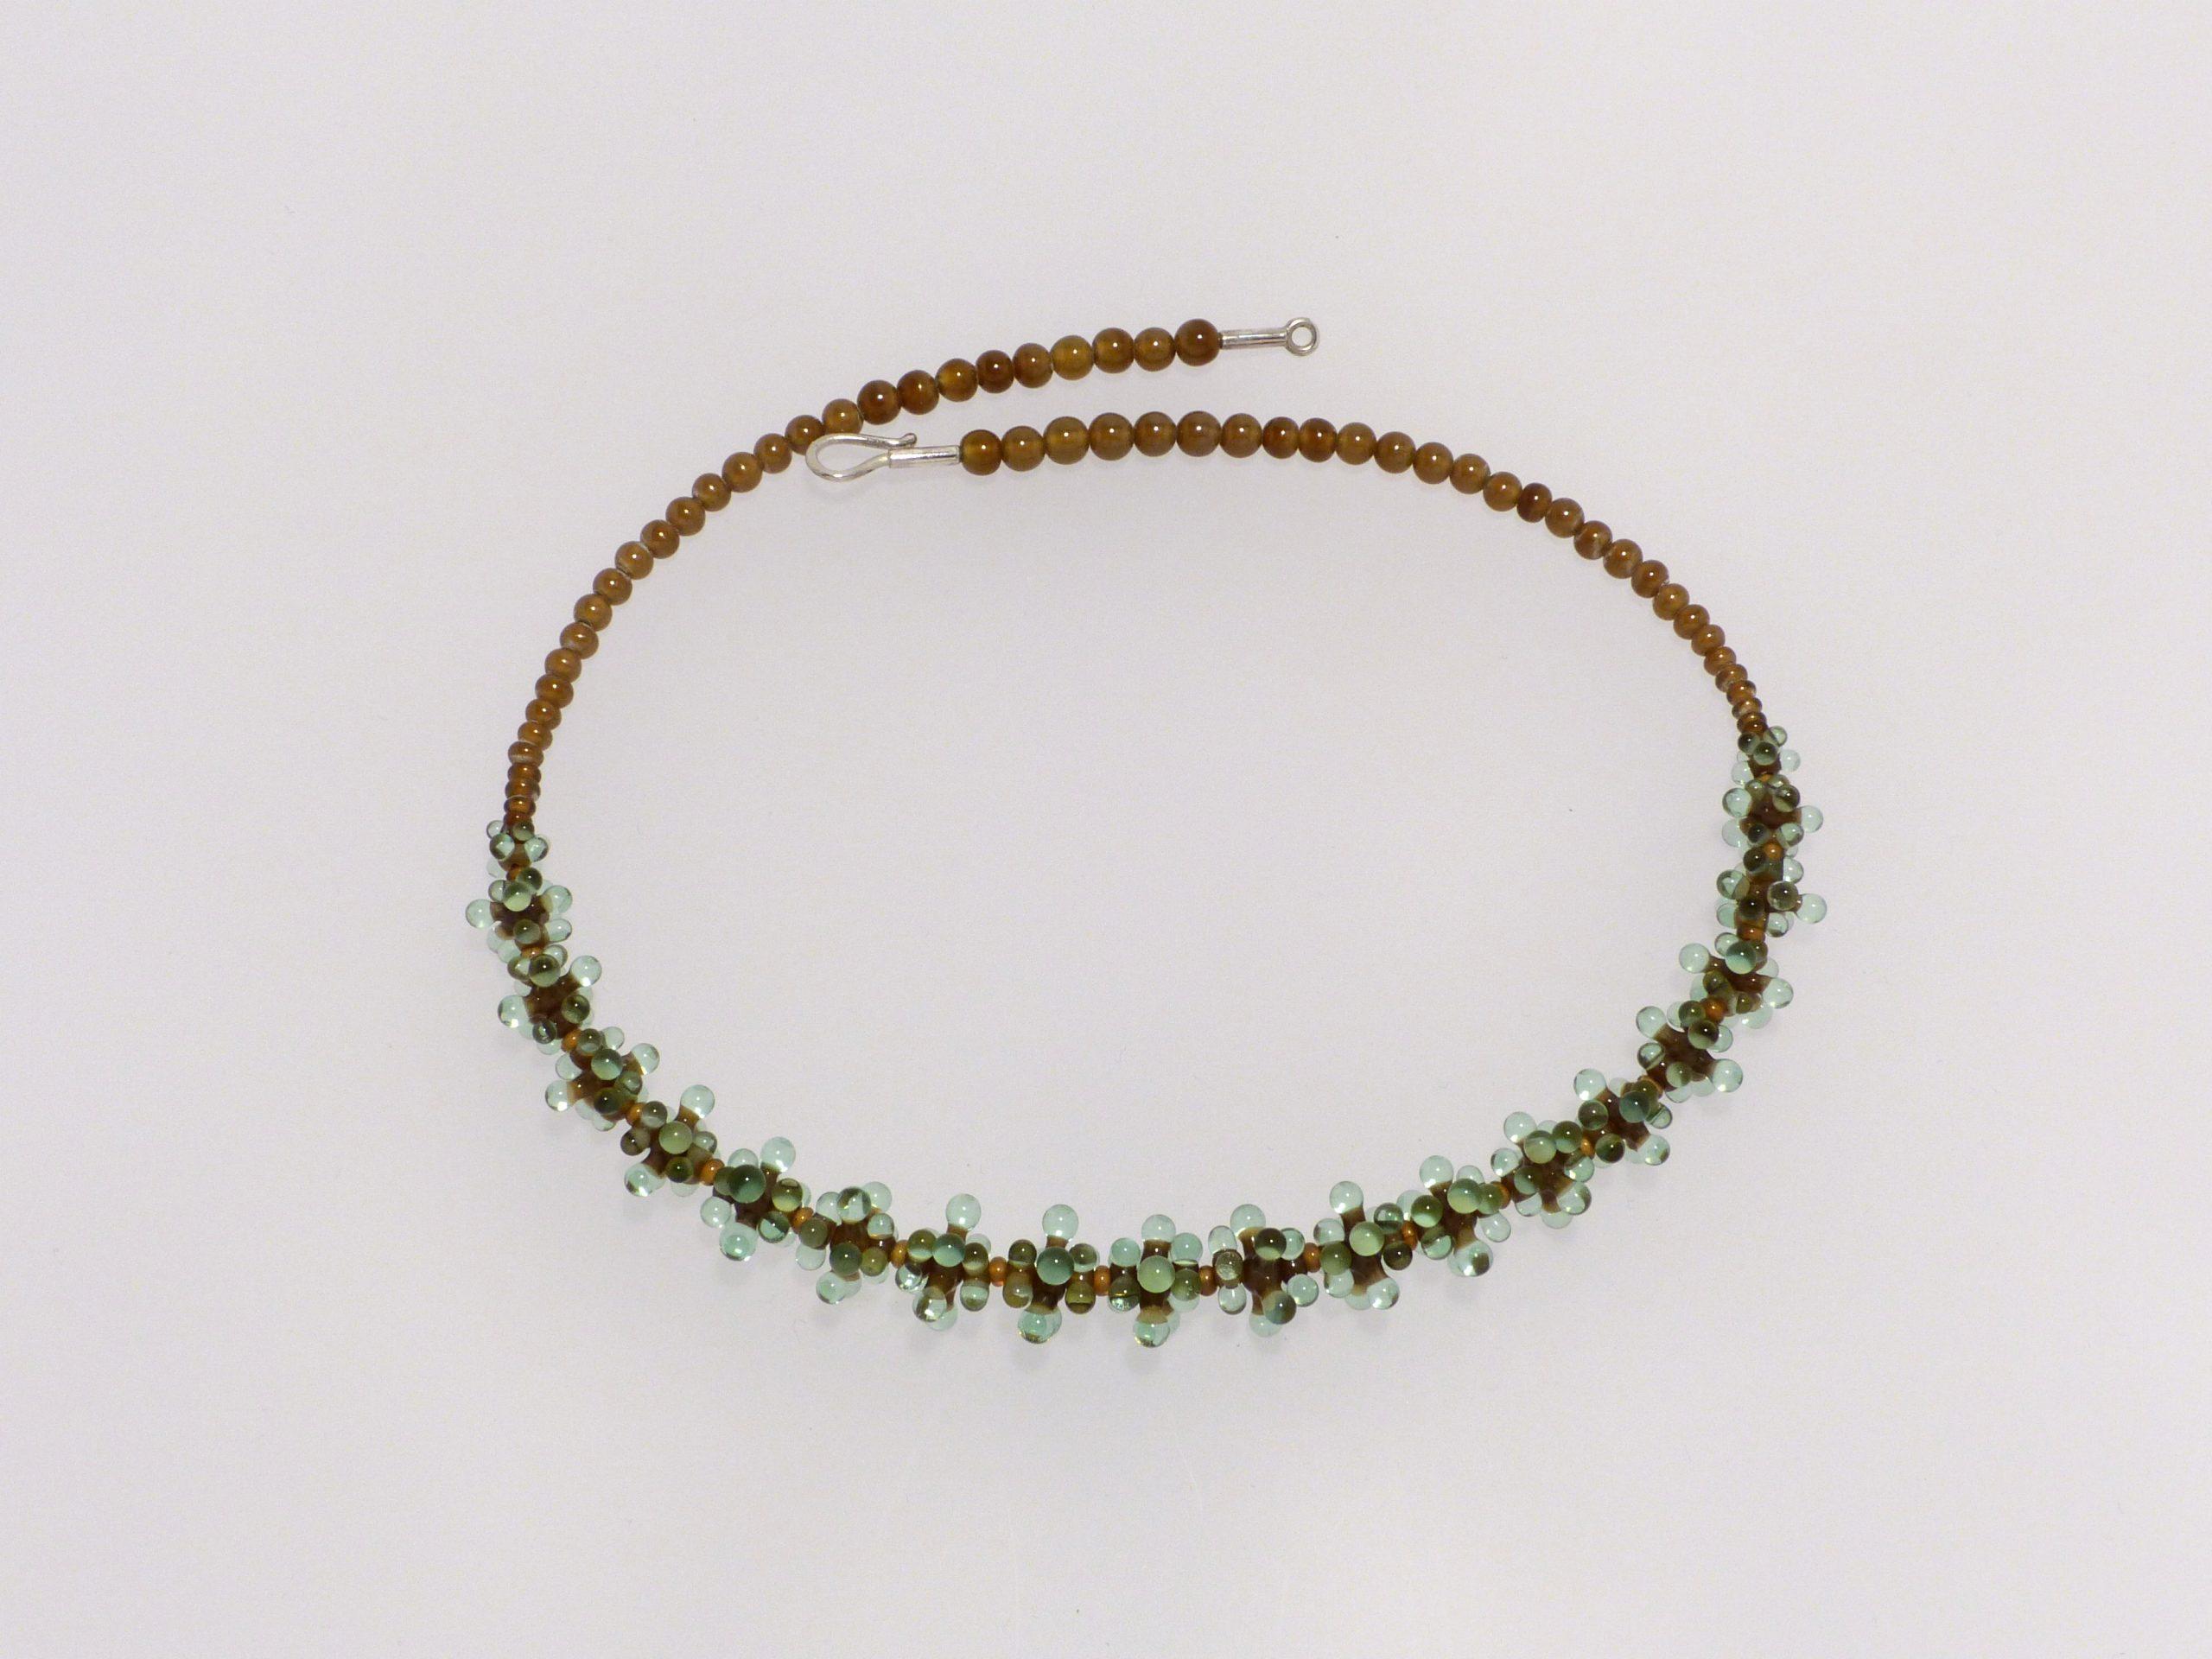 Seeanemone kugelig, klein, tabak-grüntransp. | Glas, Stahlseil, Silber | 130994-19